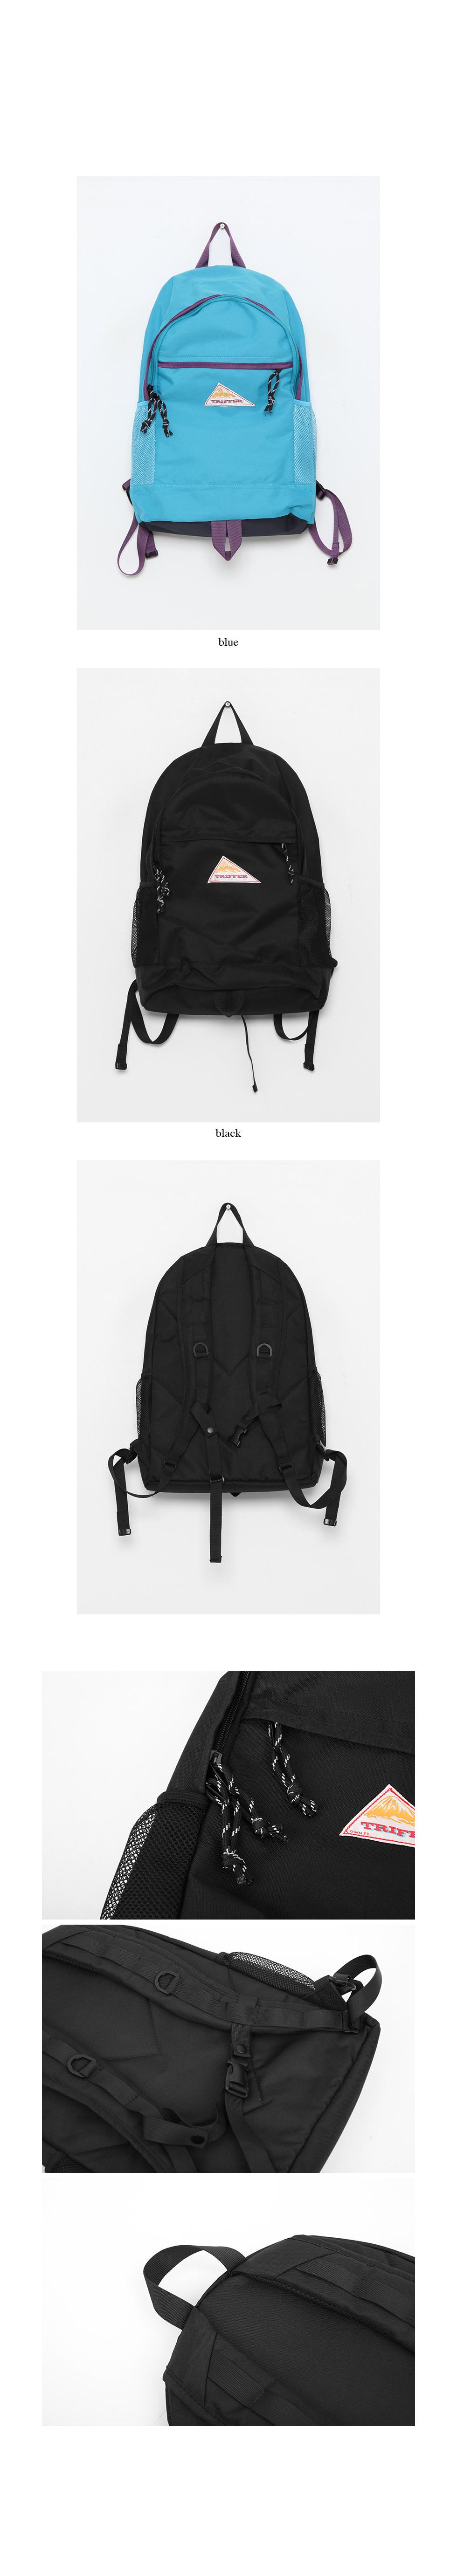 cool street backpack